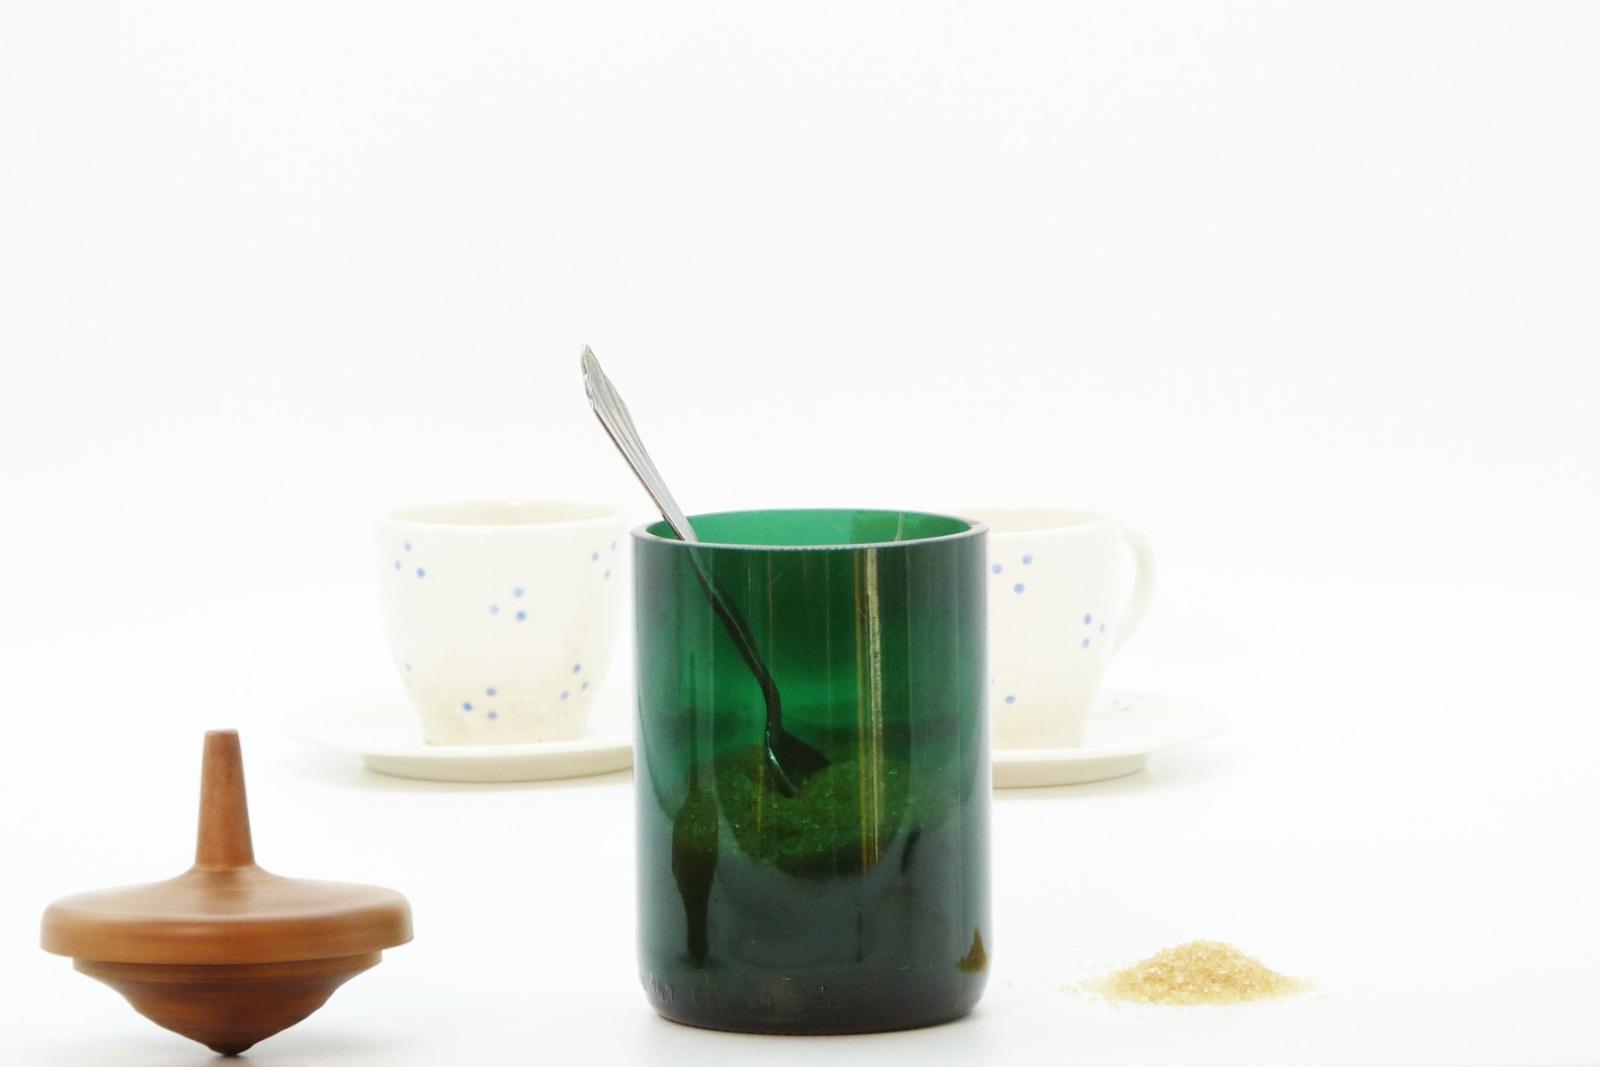 Zuckerdose aus Recyclingglas